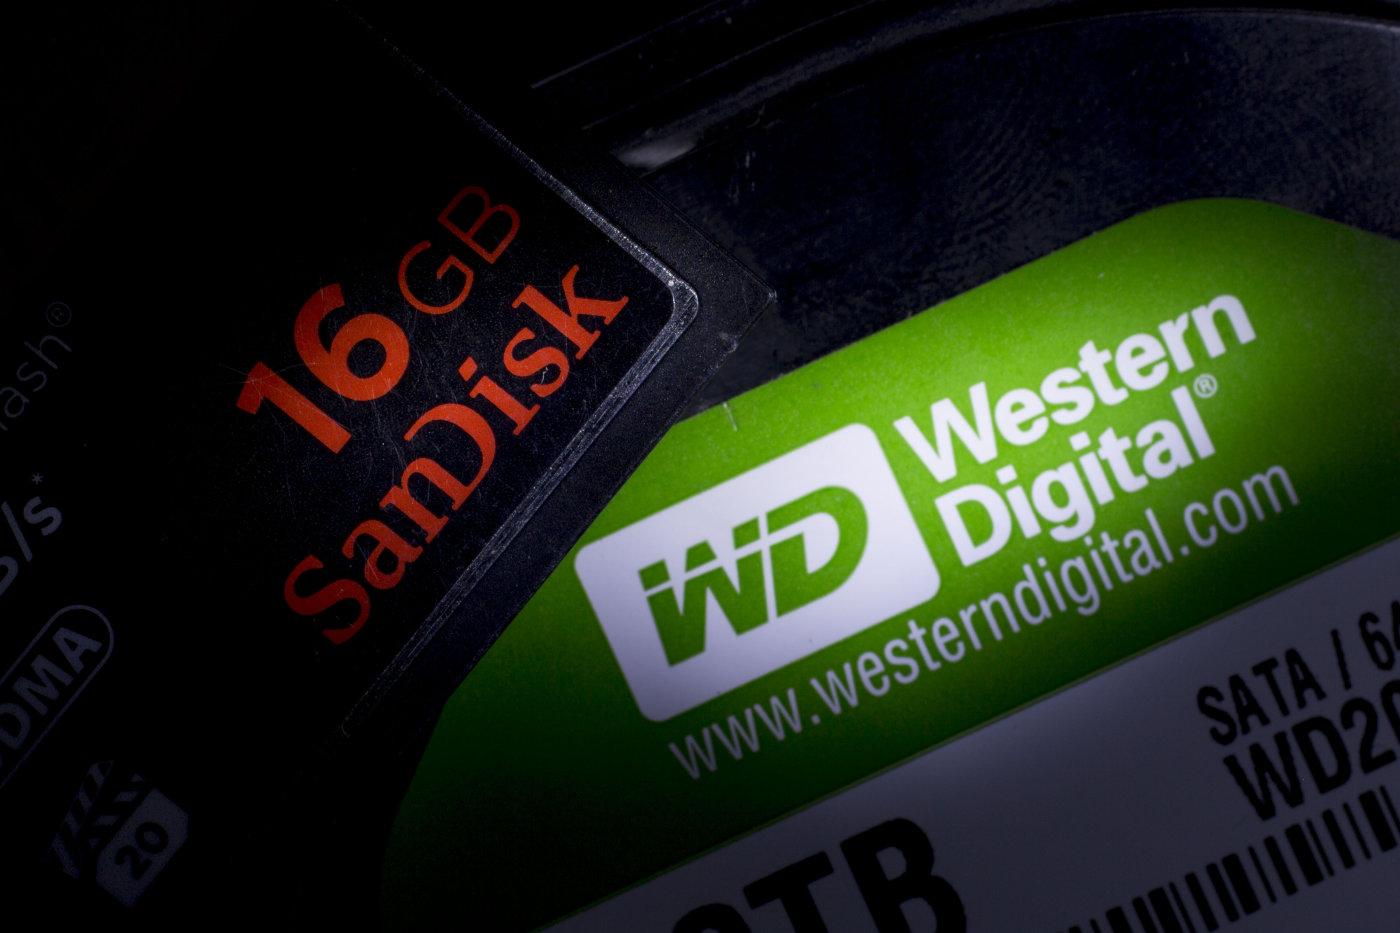 western-digital-owns-sandisk